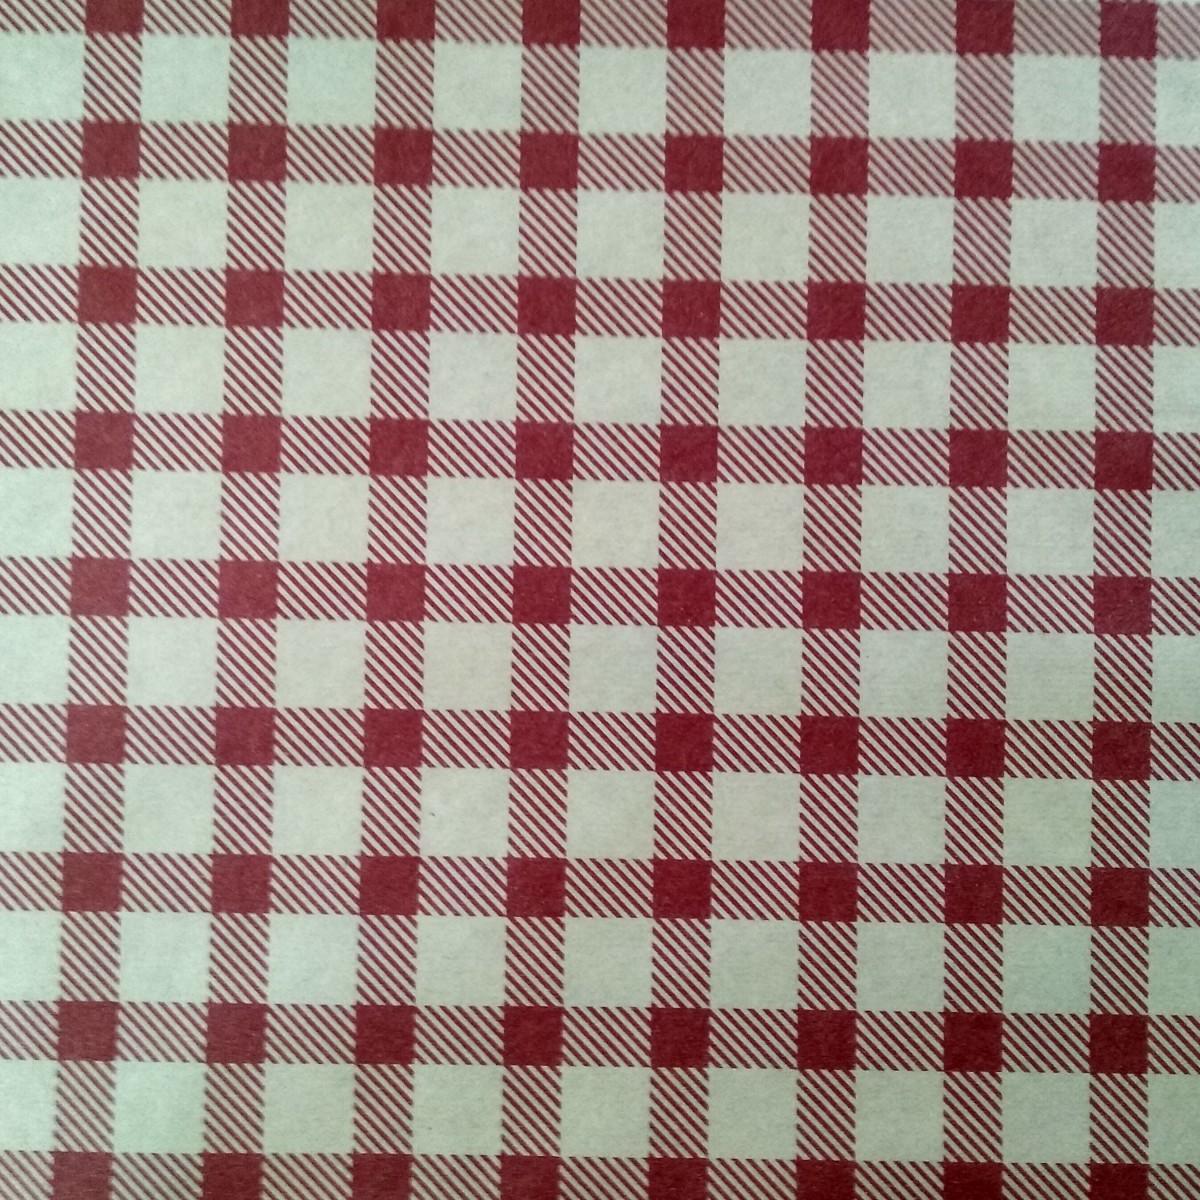 7210 Chex Print Red 50cmx25m Kraft Paper - 1 Roll